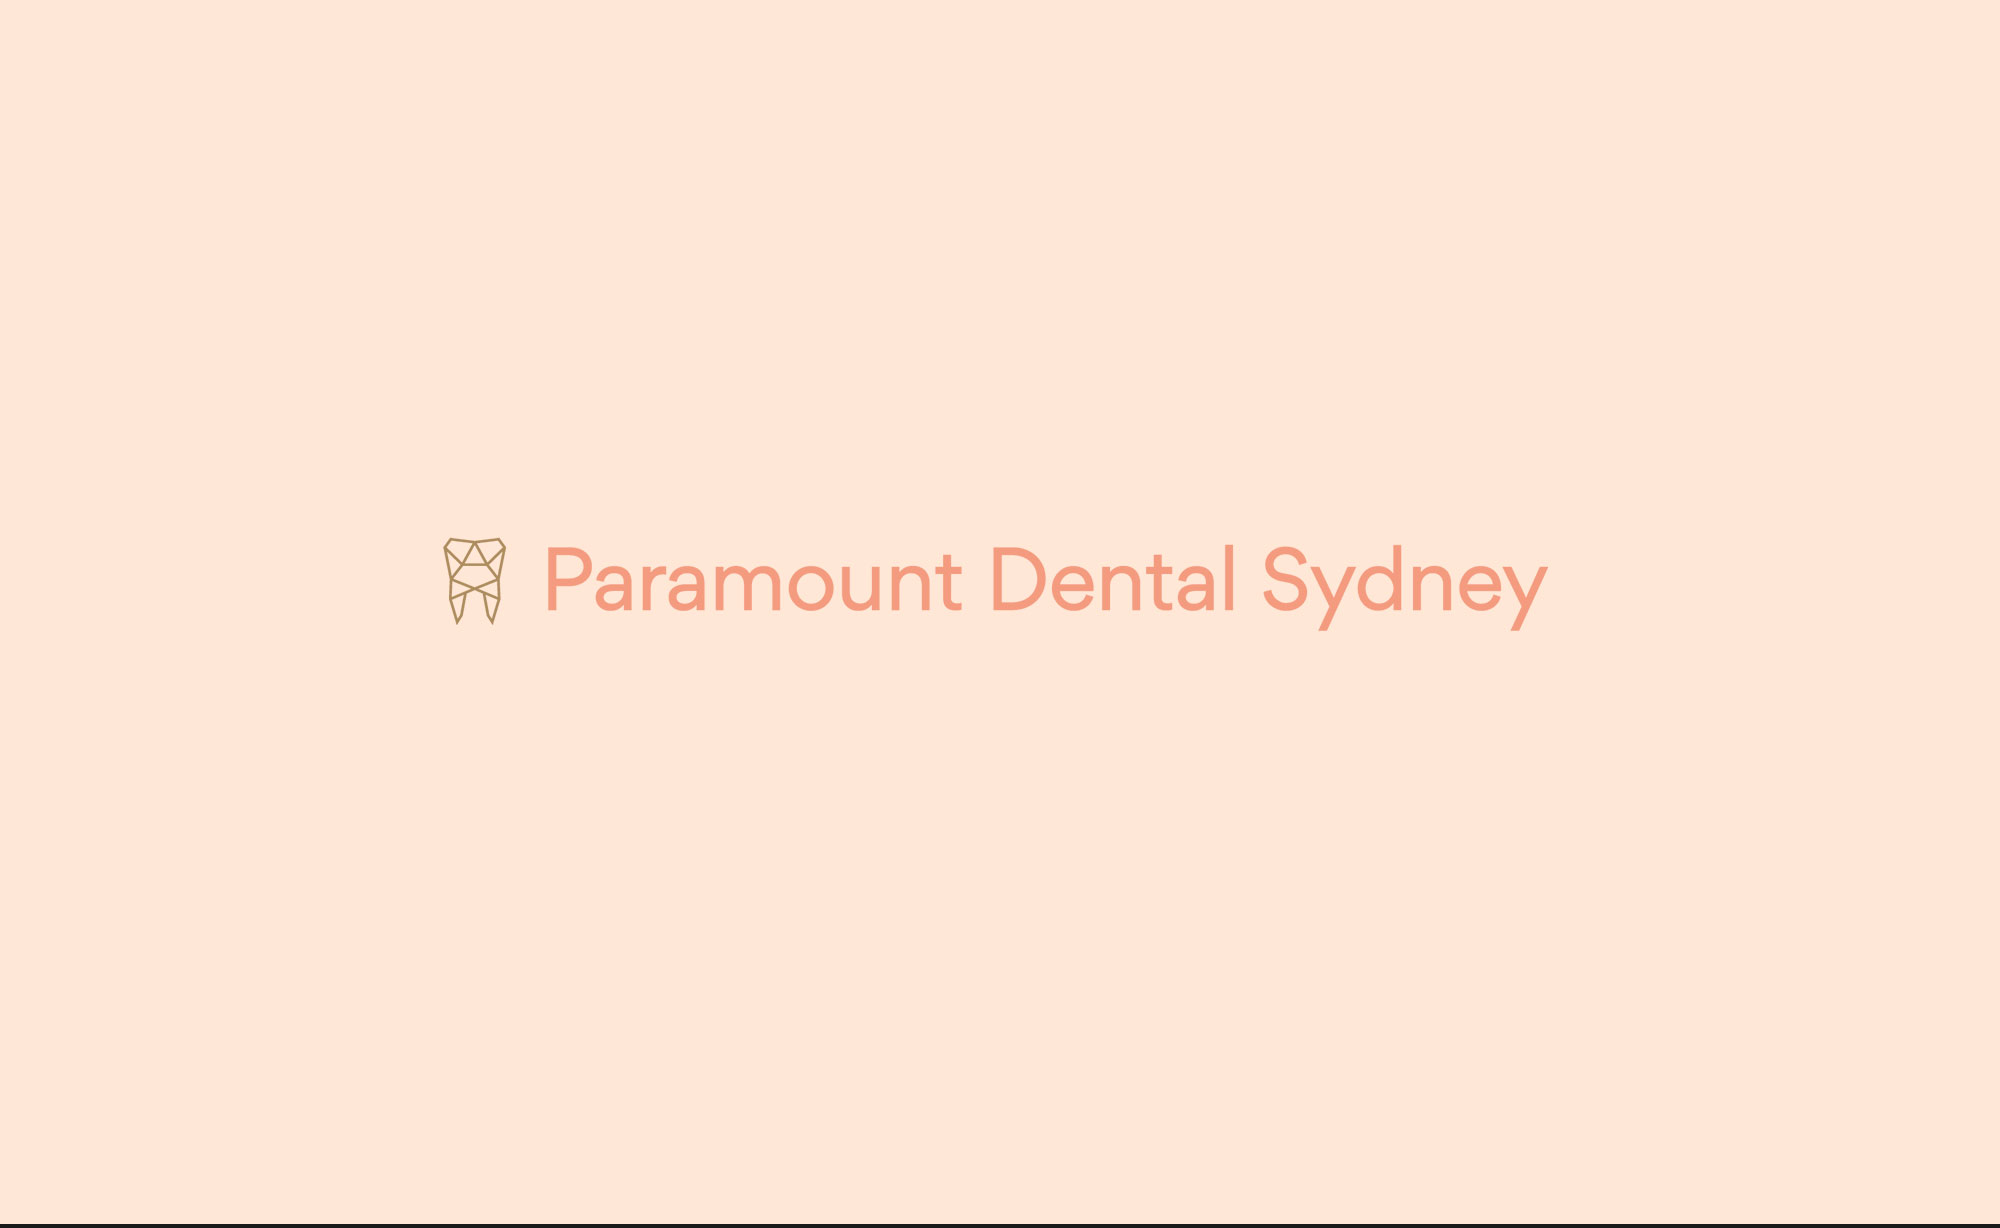 ©-Chris-Rae-Design-Paramount-Dental-Sydney-Brand-Design.jpg